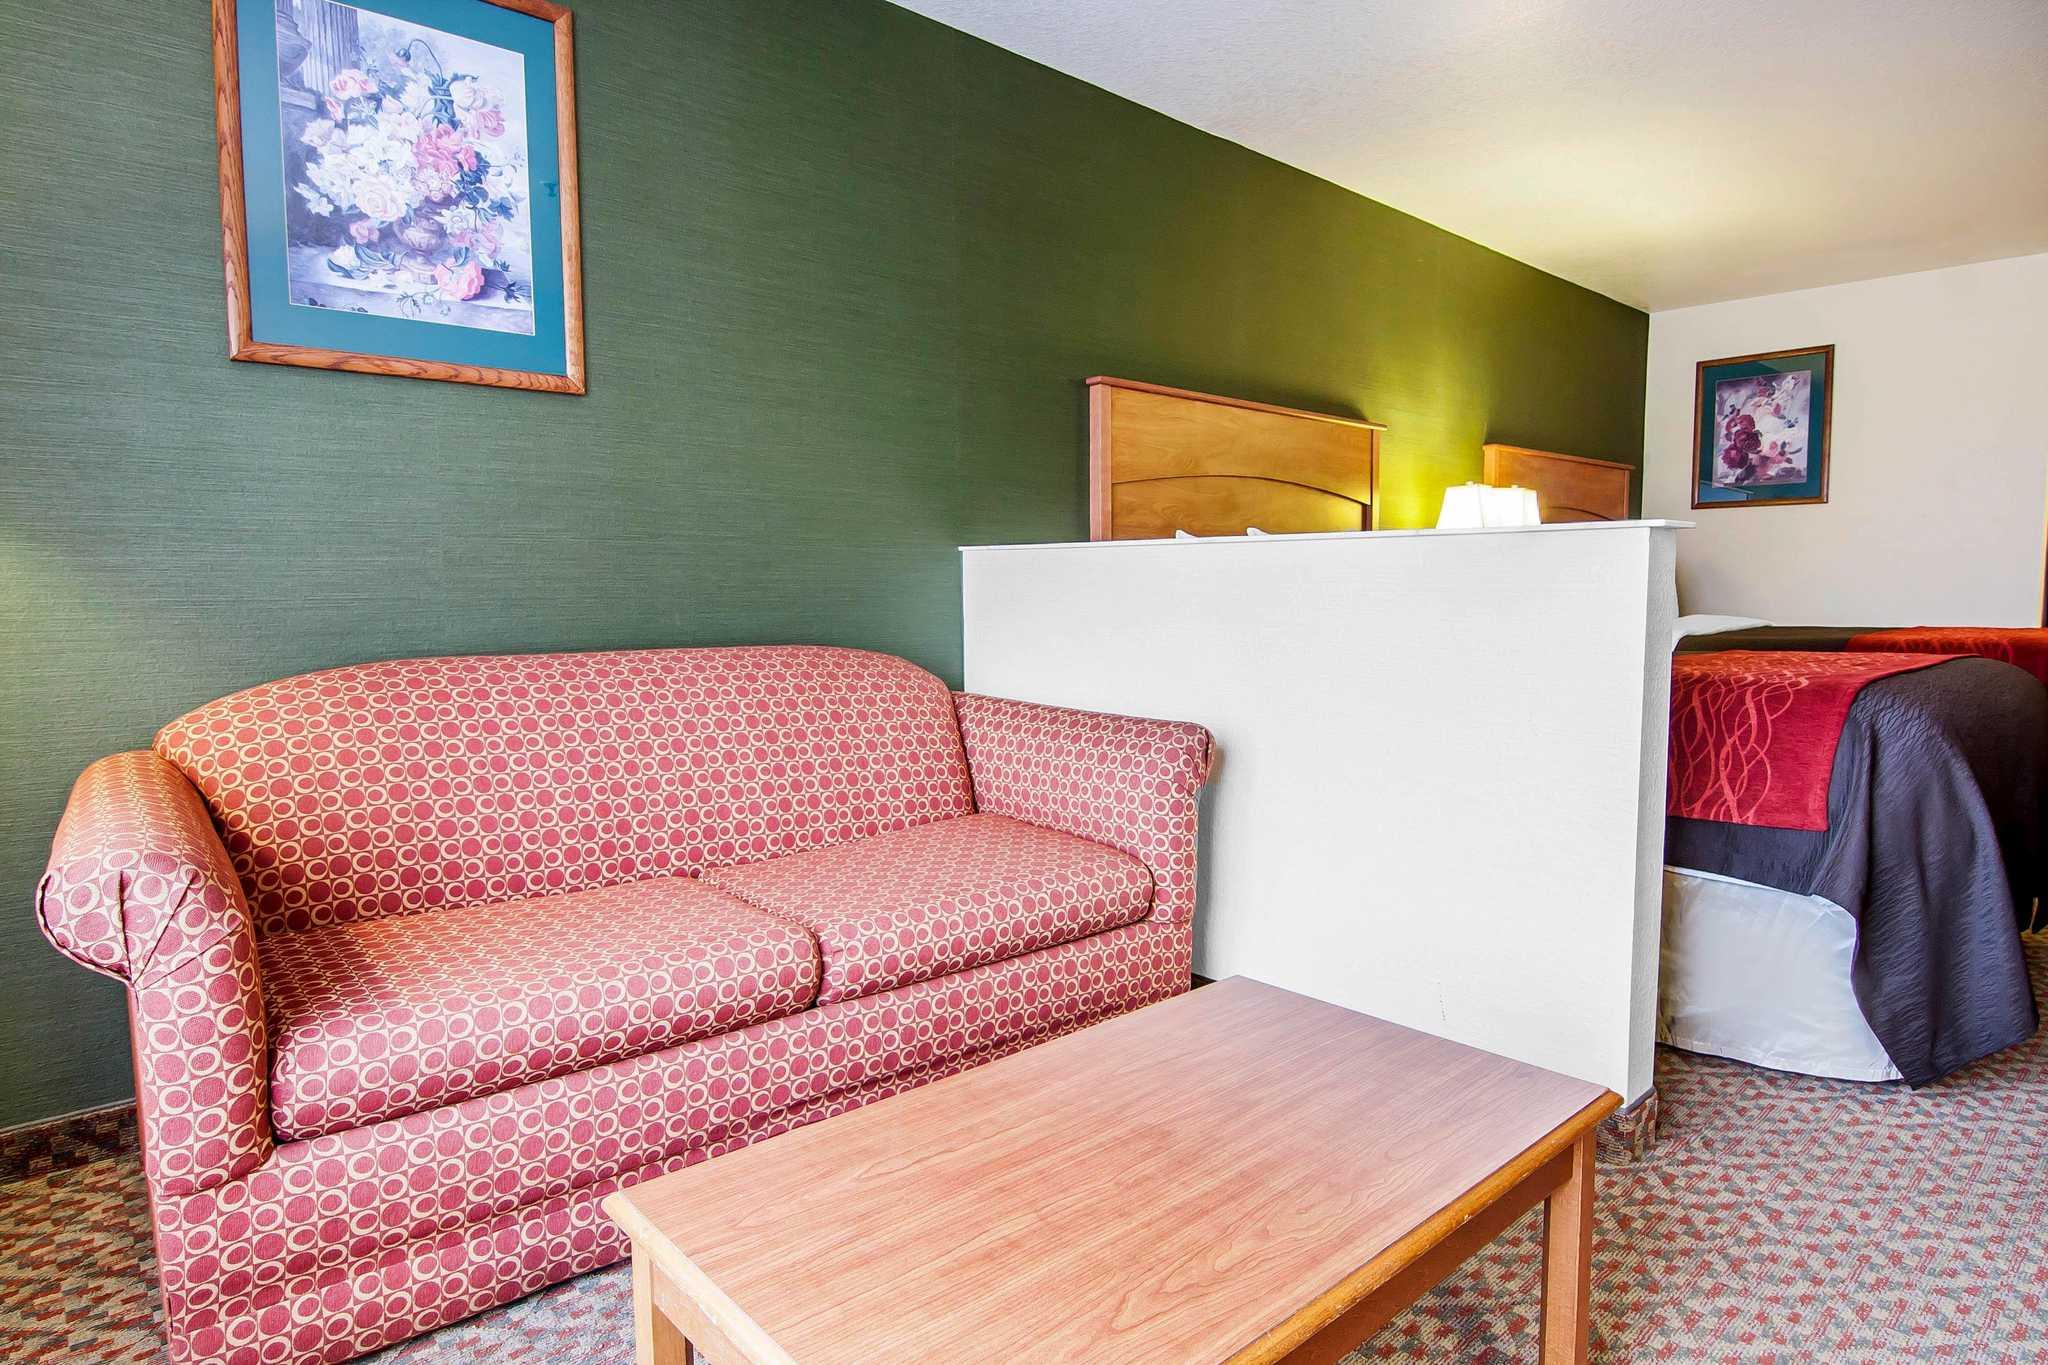 Comfort Inn & Suites image 45